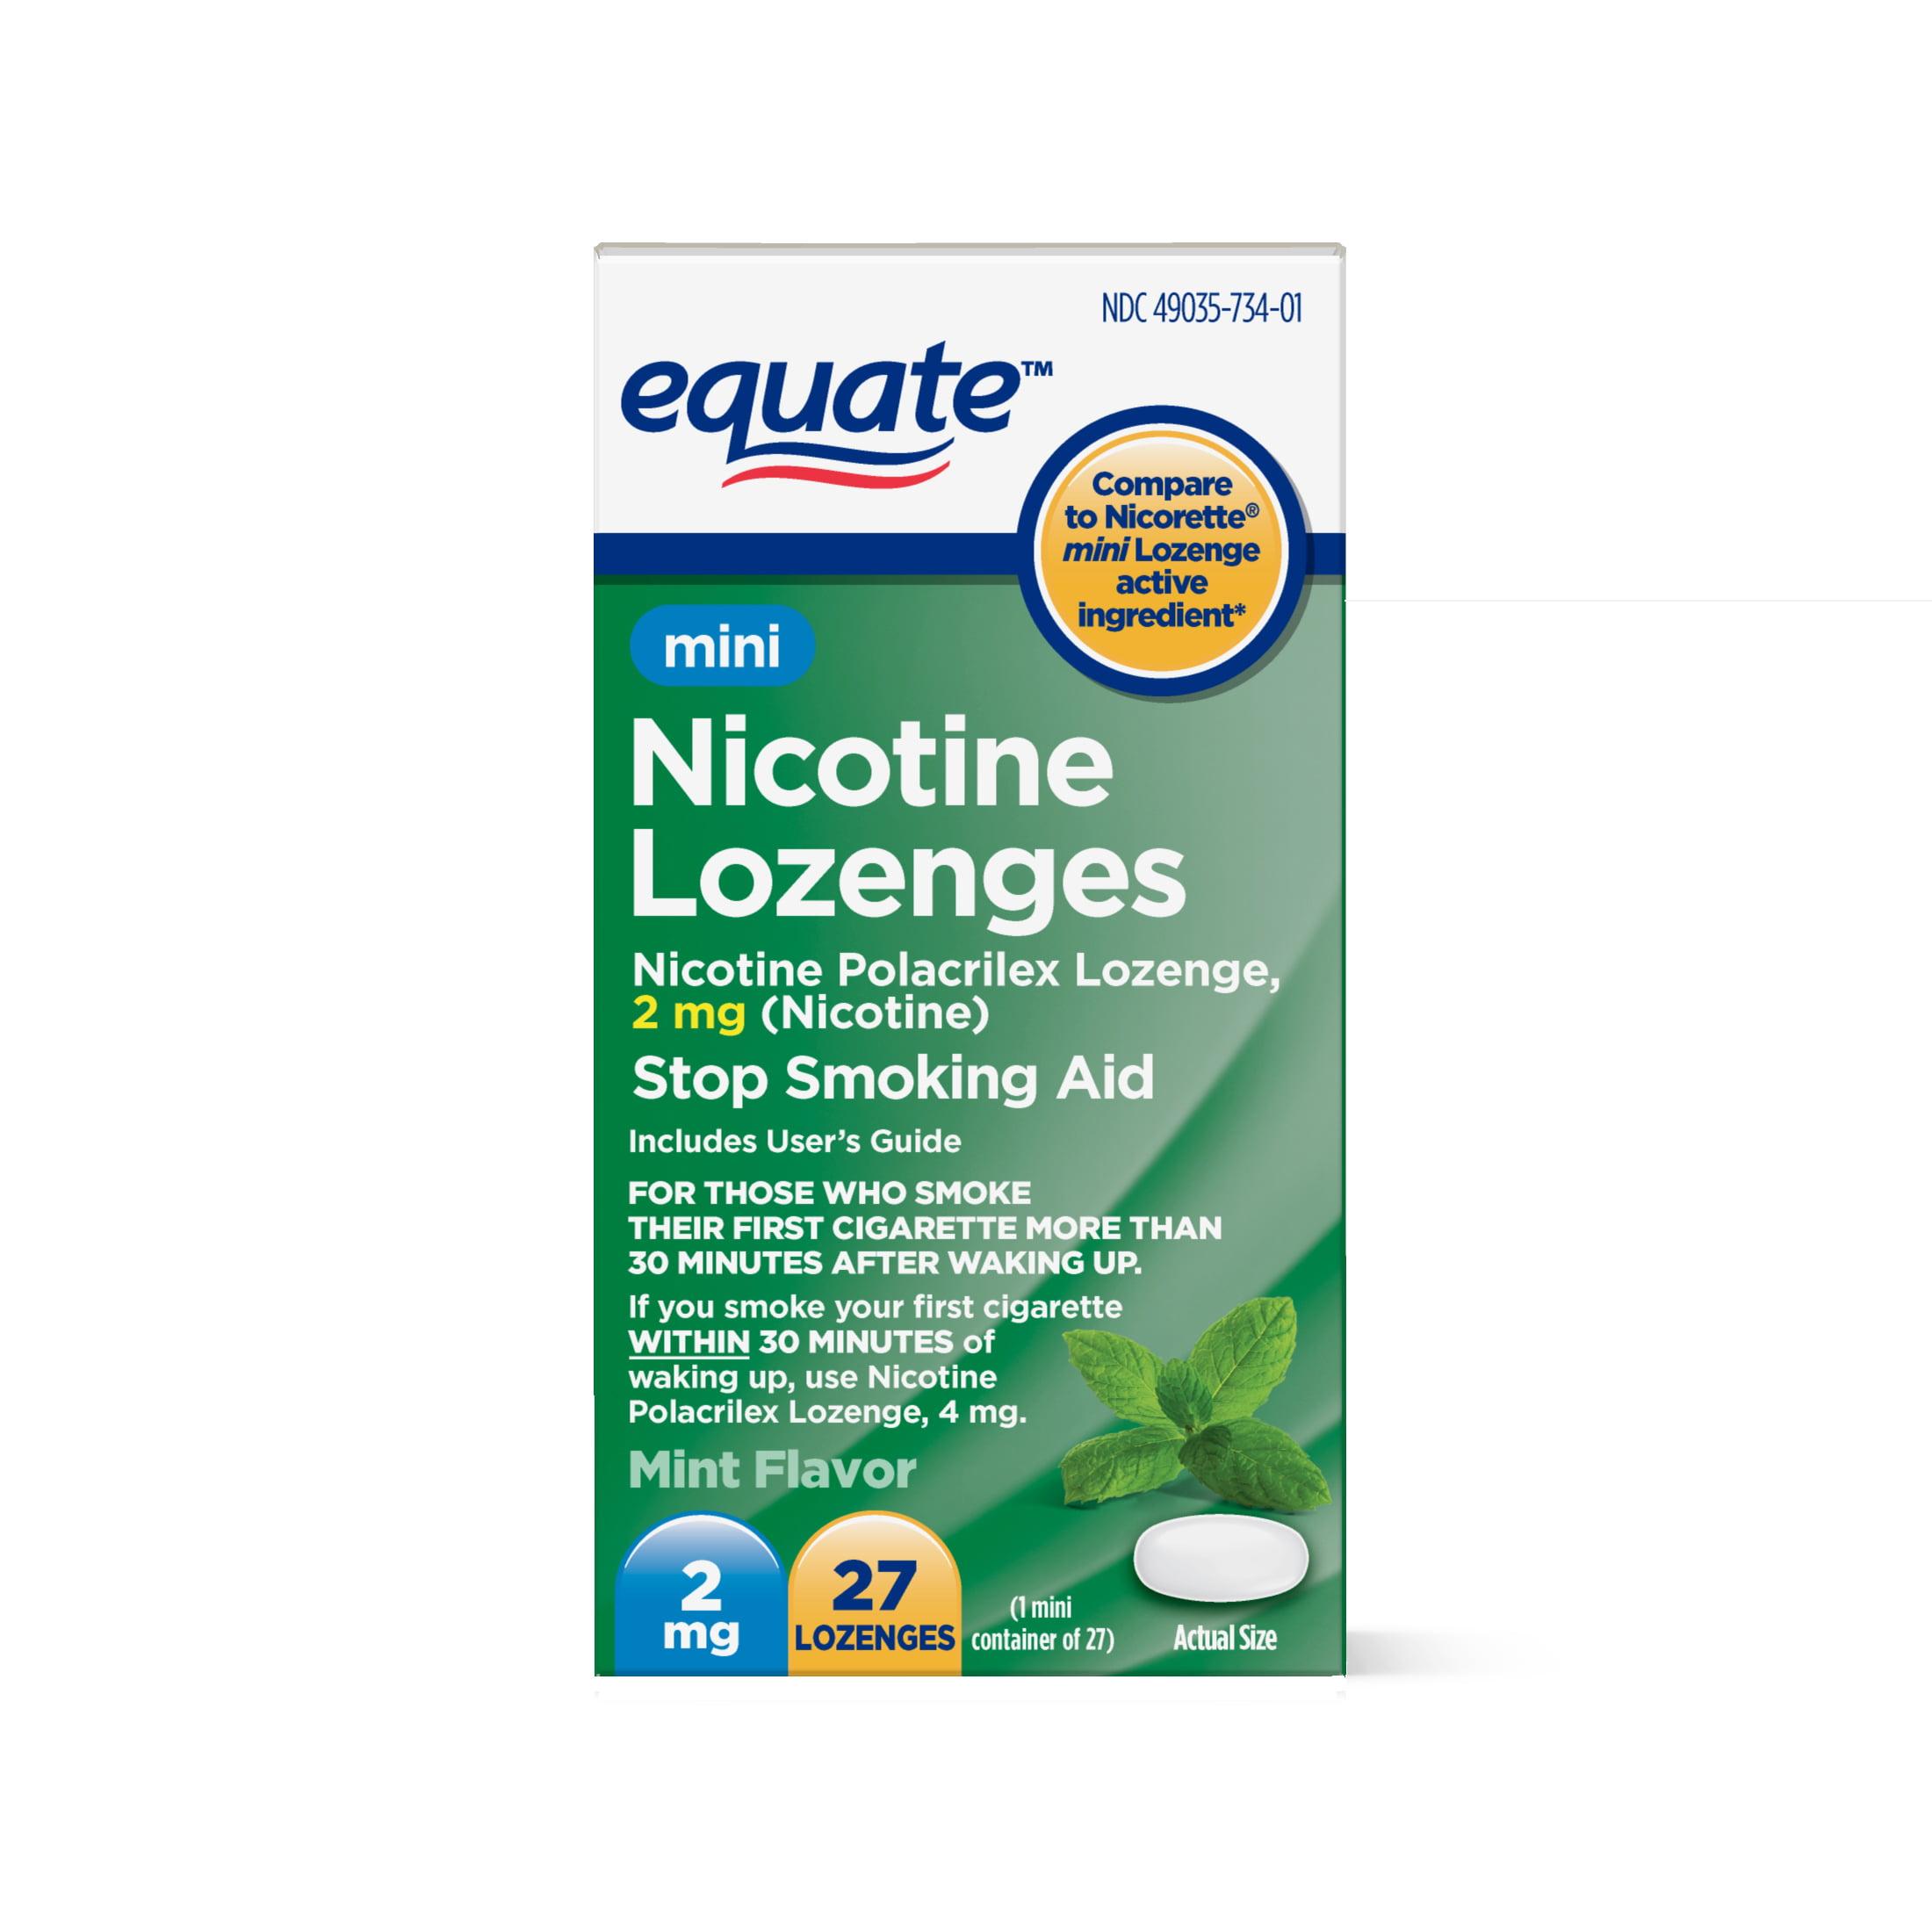 Equate Mini Nicotine Lozenges, Mint Flavor, 2 mg, 27 Count